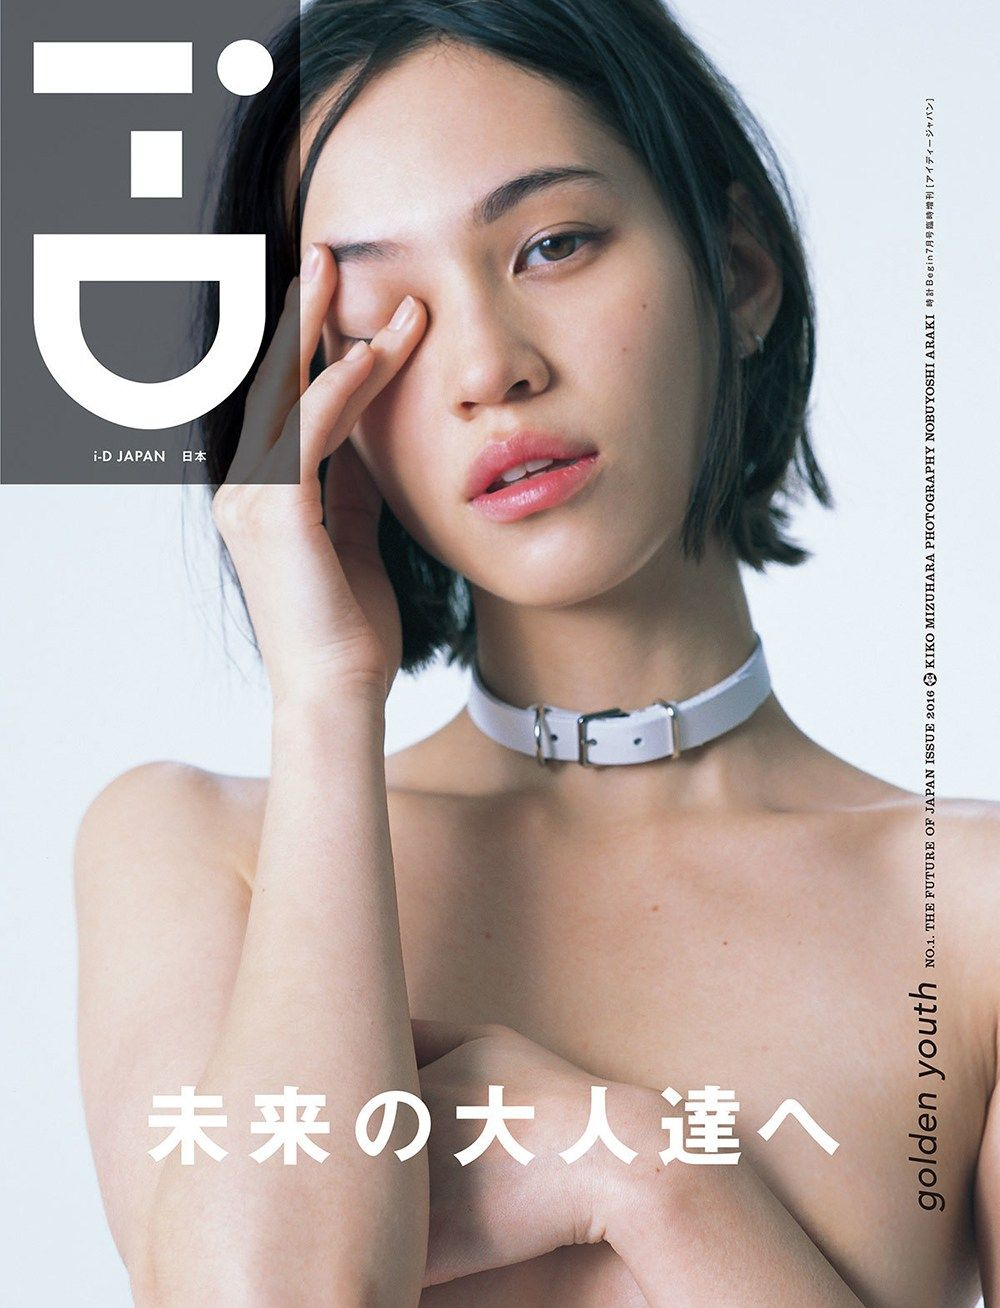 Kiko Mizuhara By Nobuyoshi Araki For i-D Magazine Japan May 2016 Cover